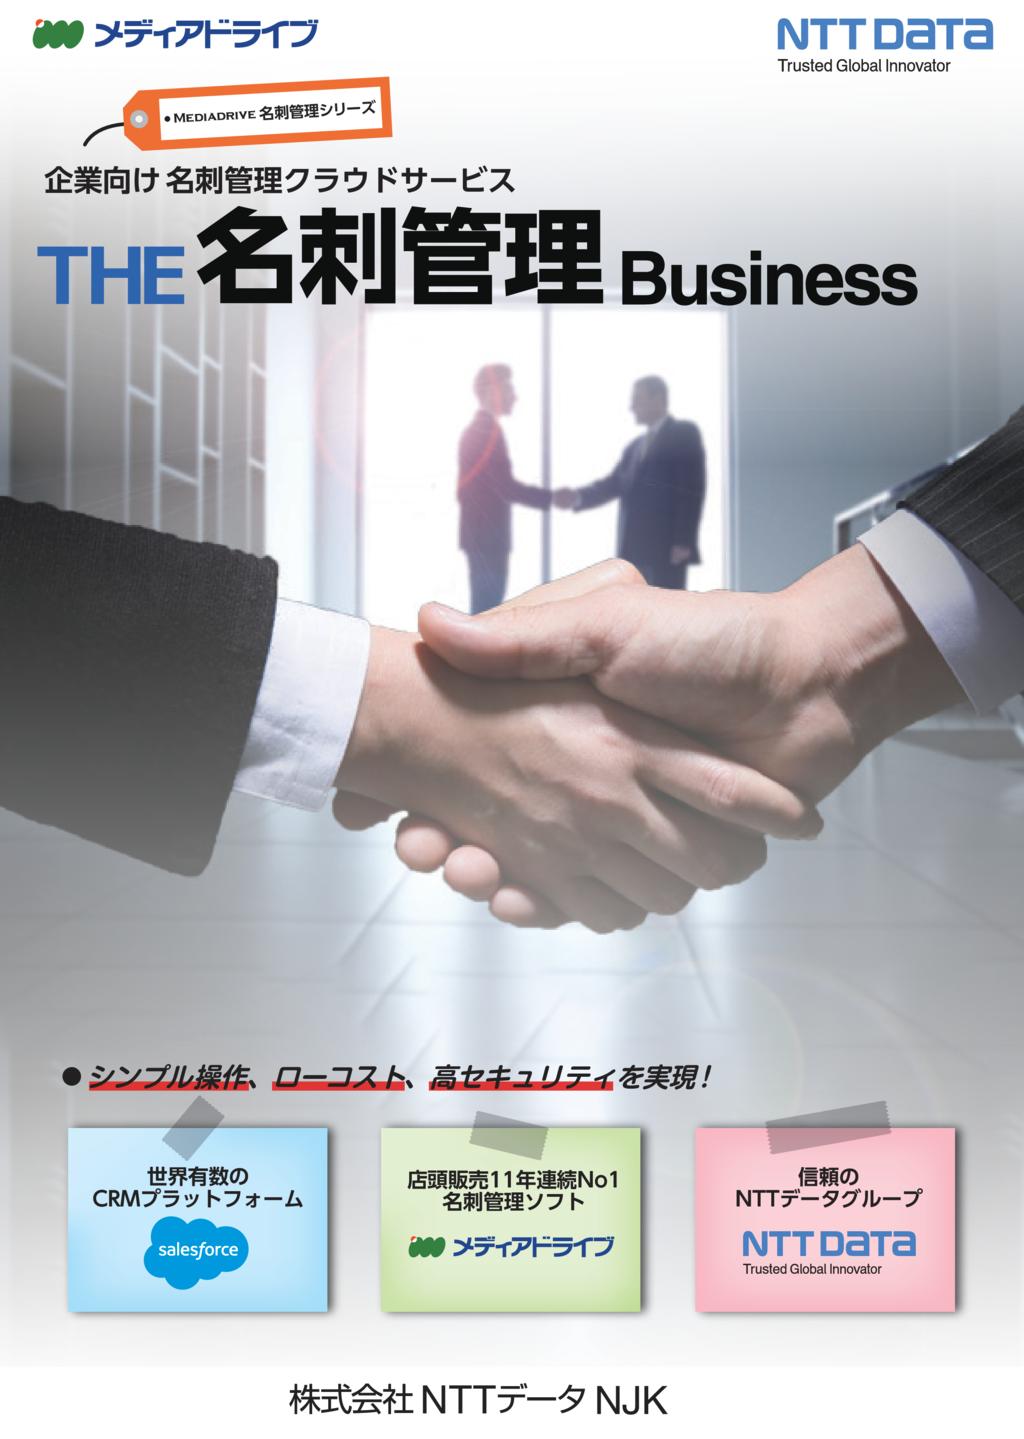 THE 名刺管理 Businessの資料